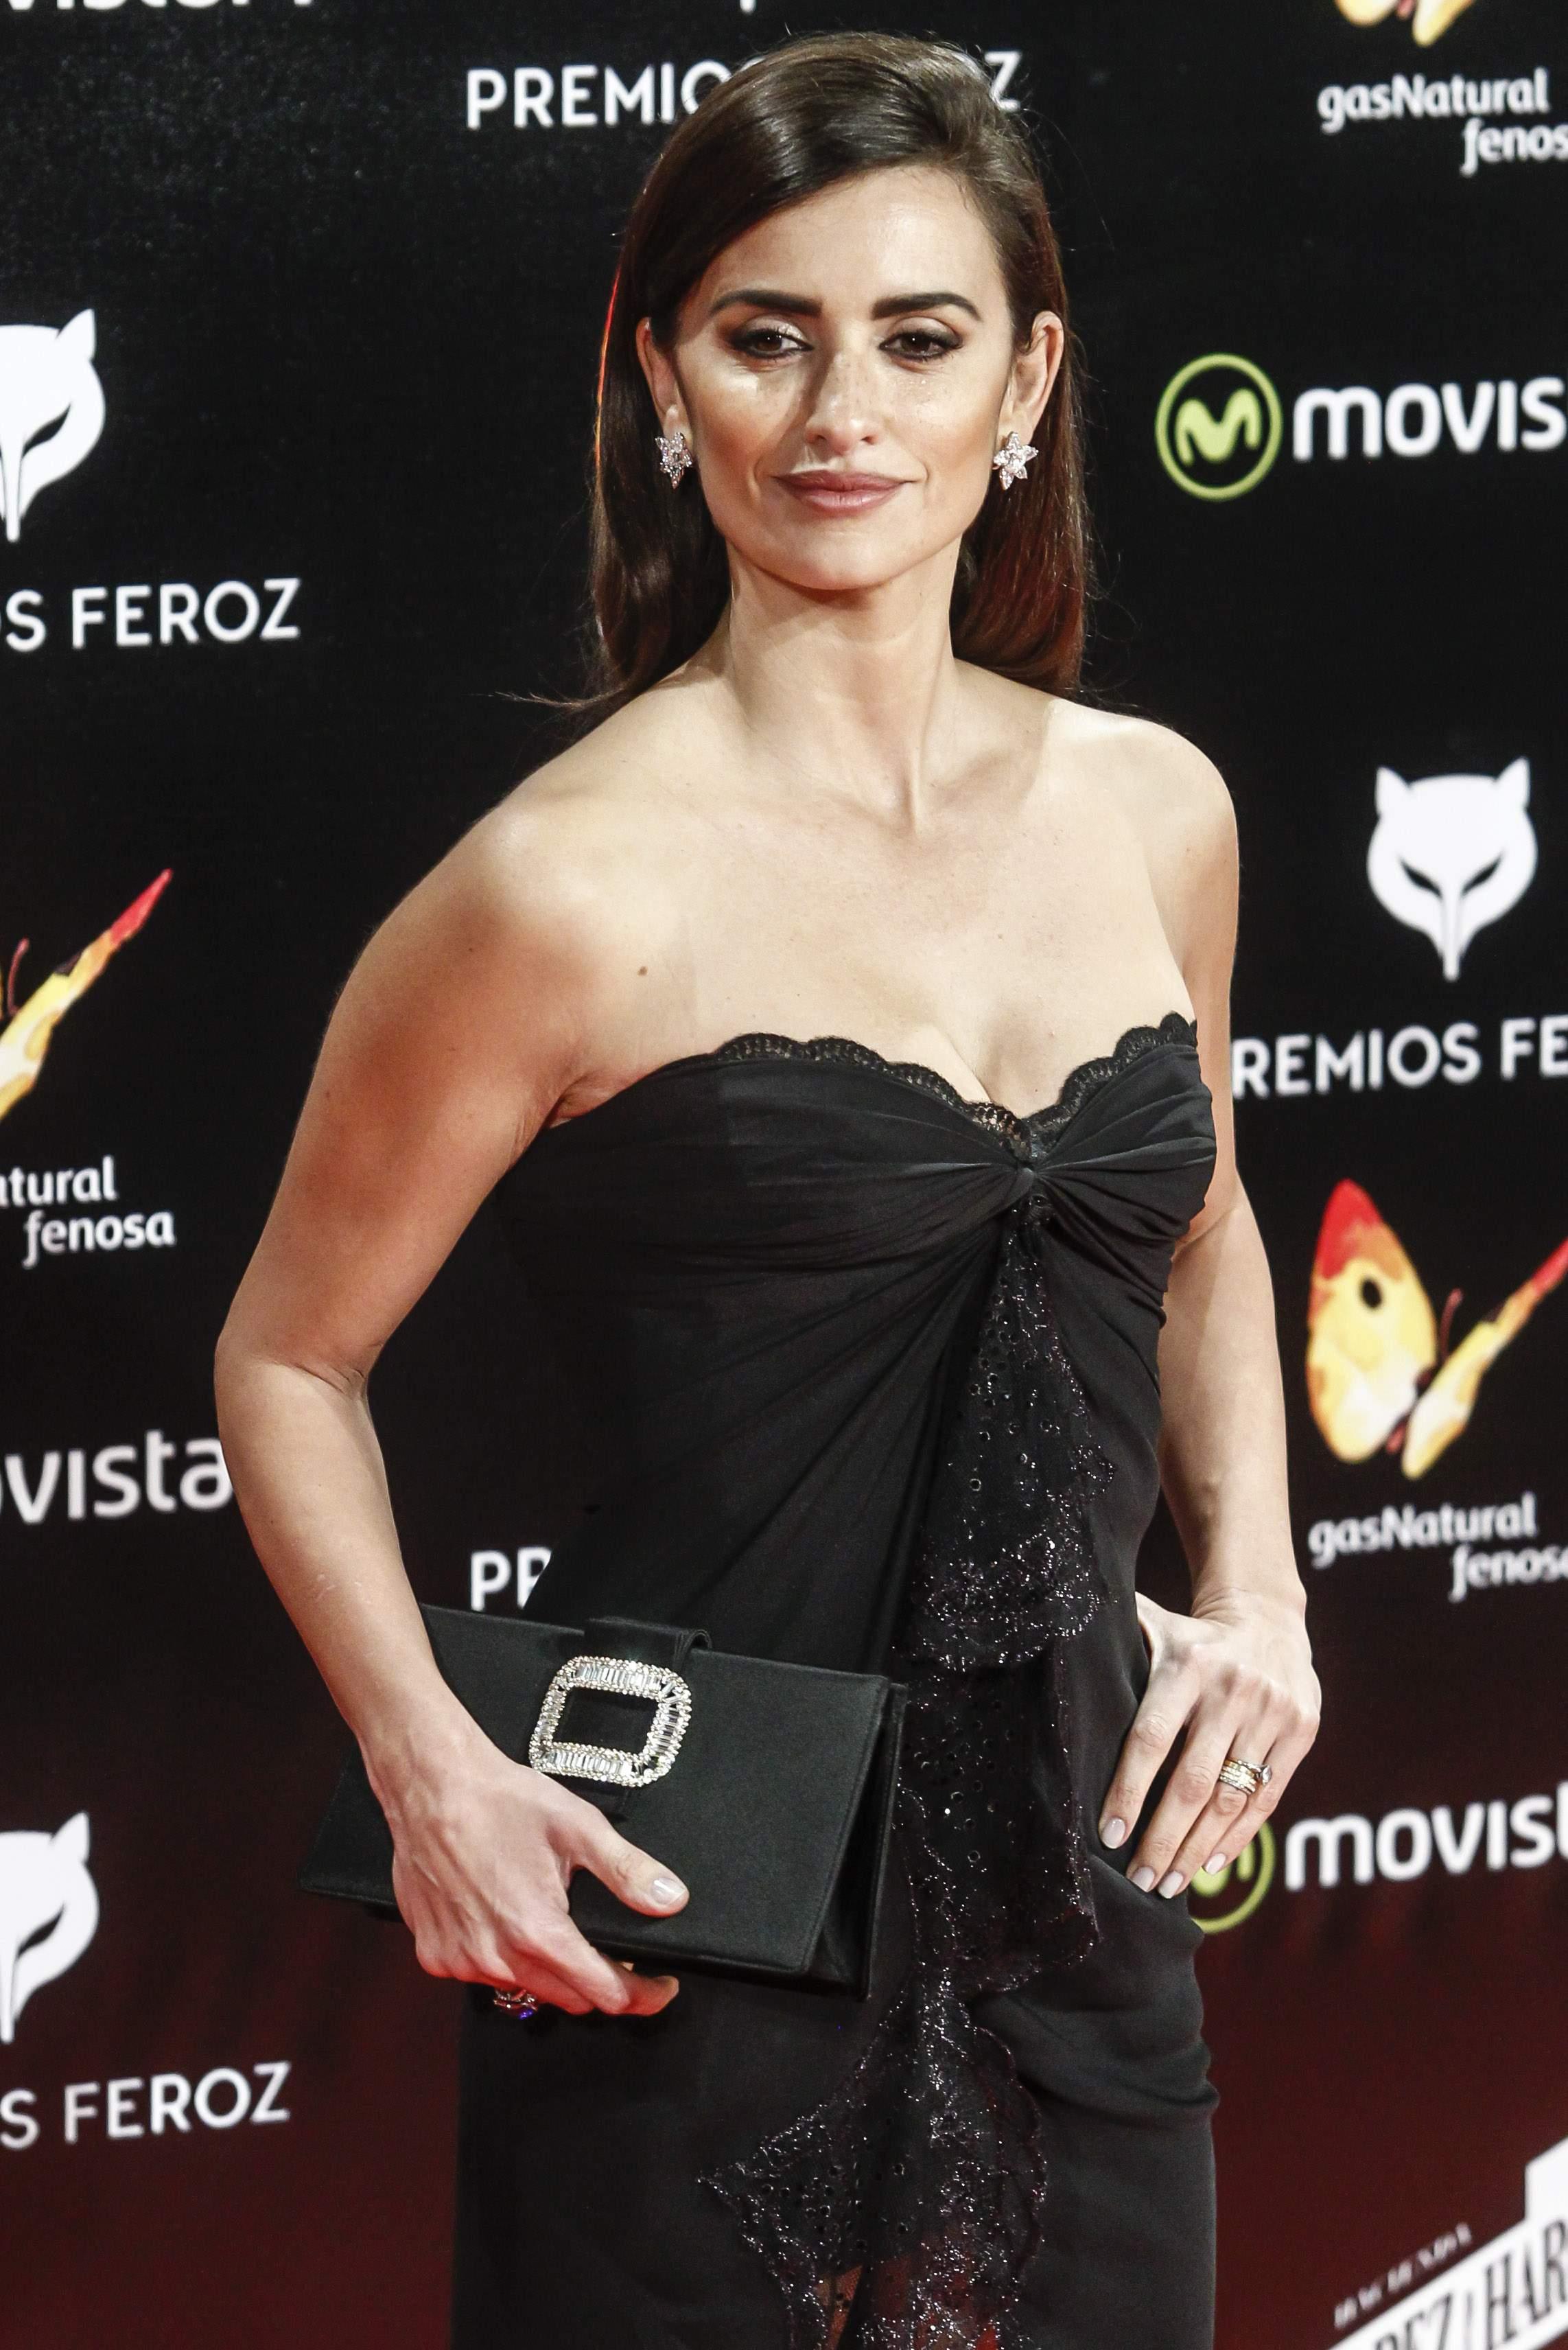 Penelope Cruz Attendse Feroz Awards-1